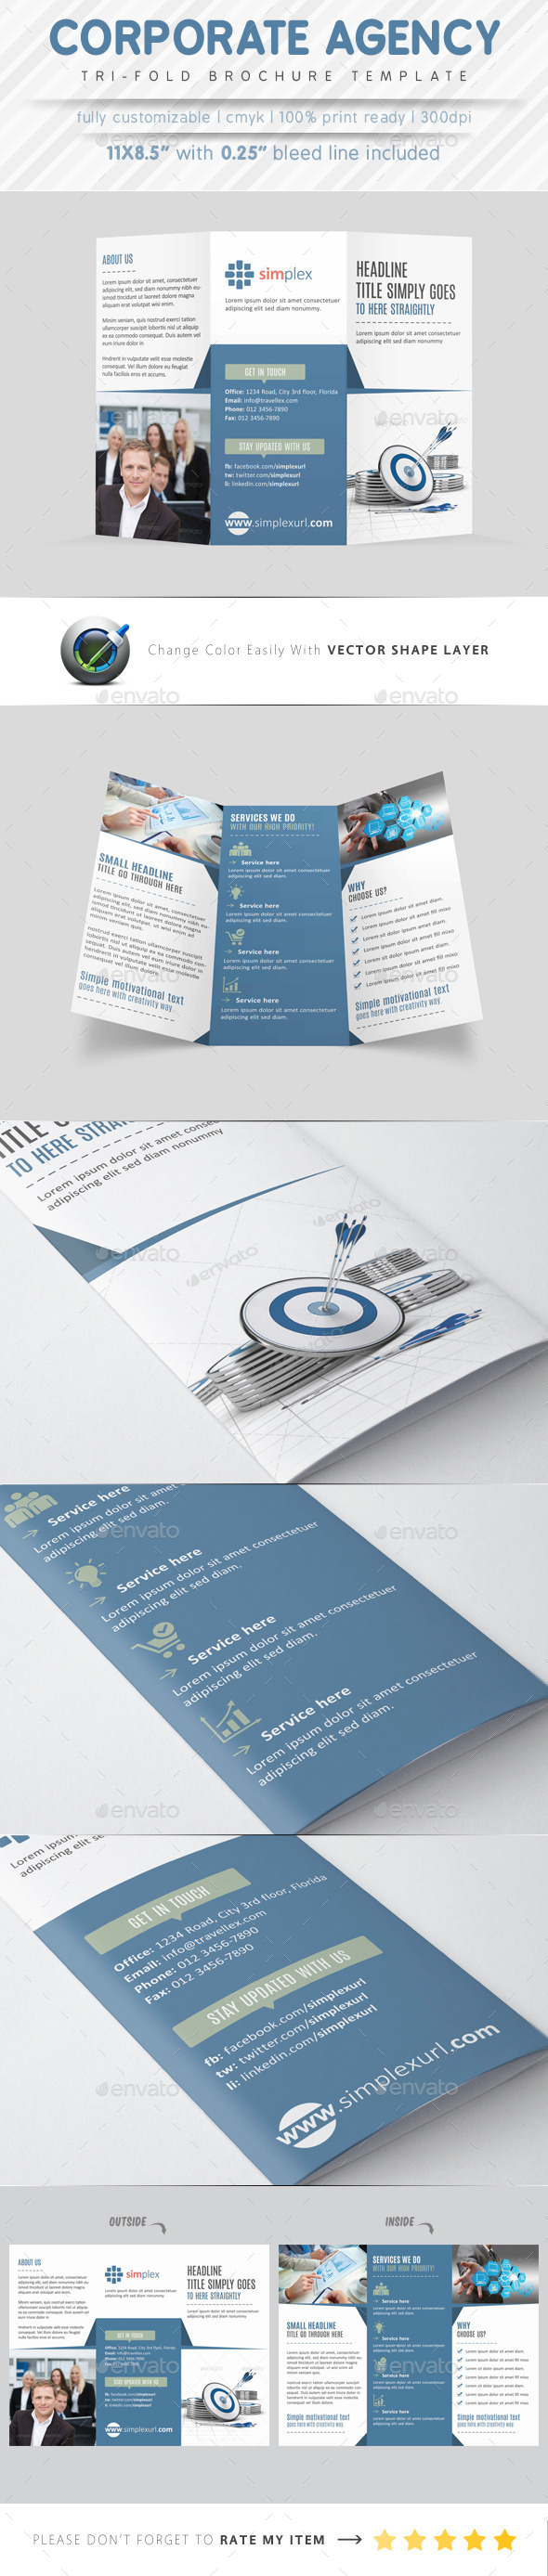 Corporate Agency Tri Fold Brochure - Corporate Brochures